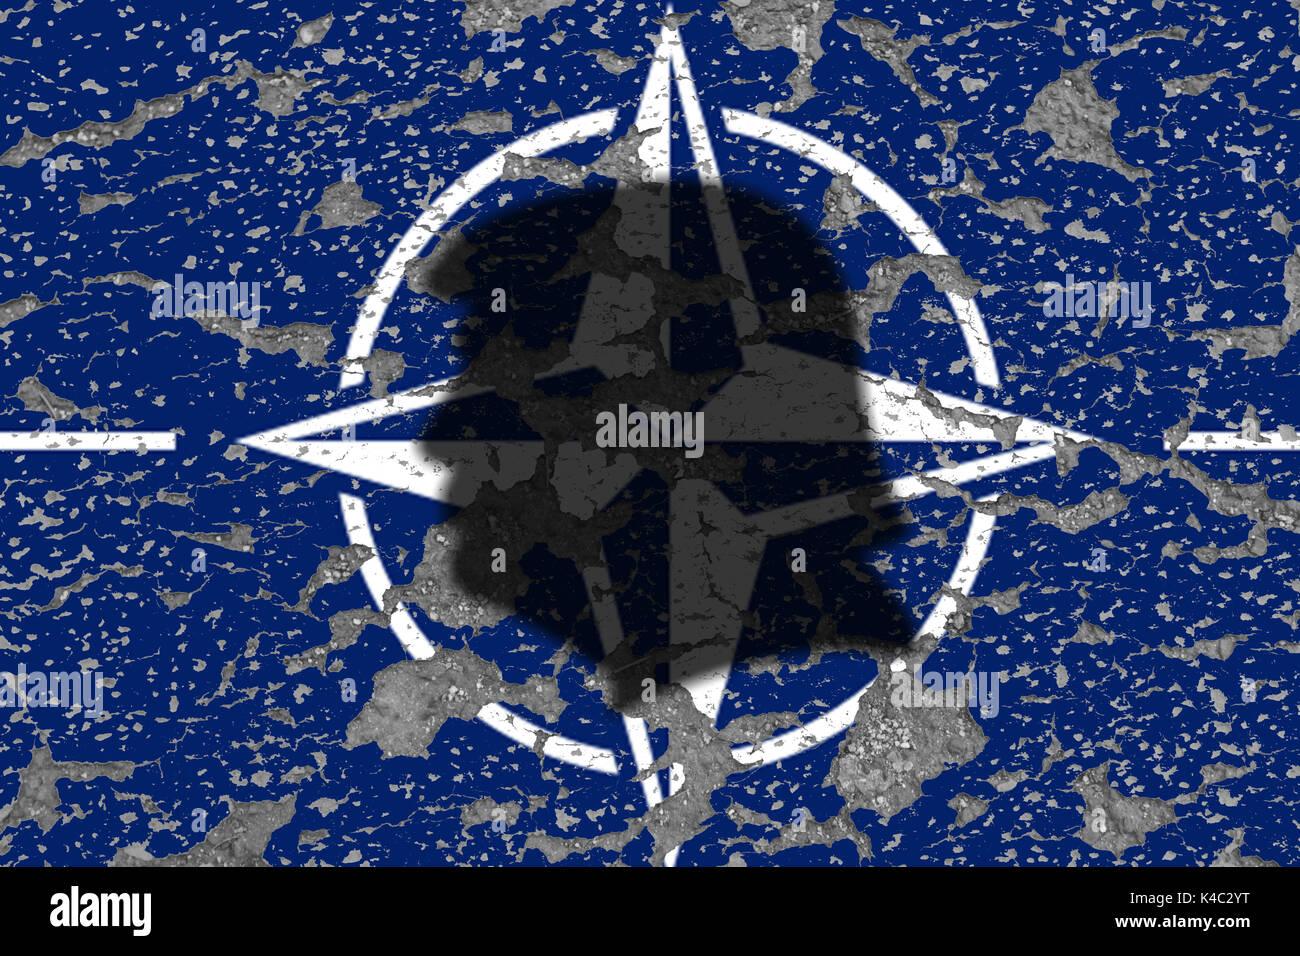 Donald Trump Shadow With Eroding Nato Otan Sign Stock Photo